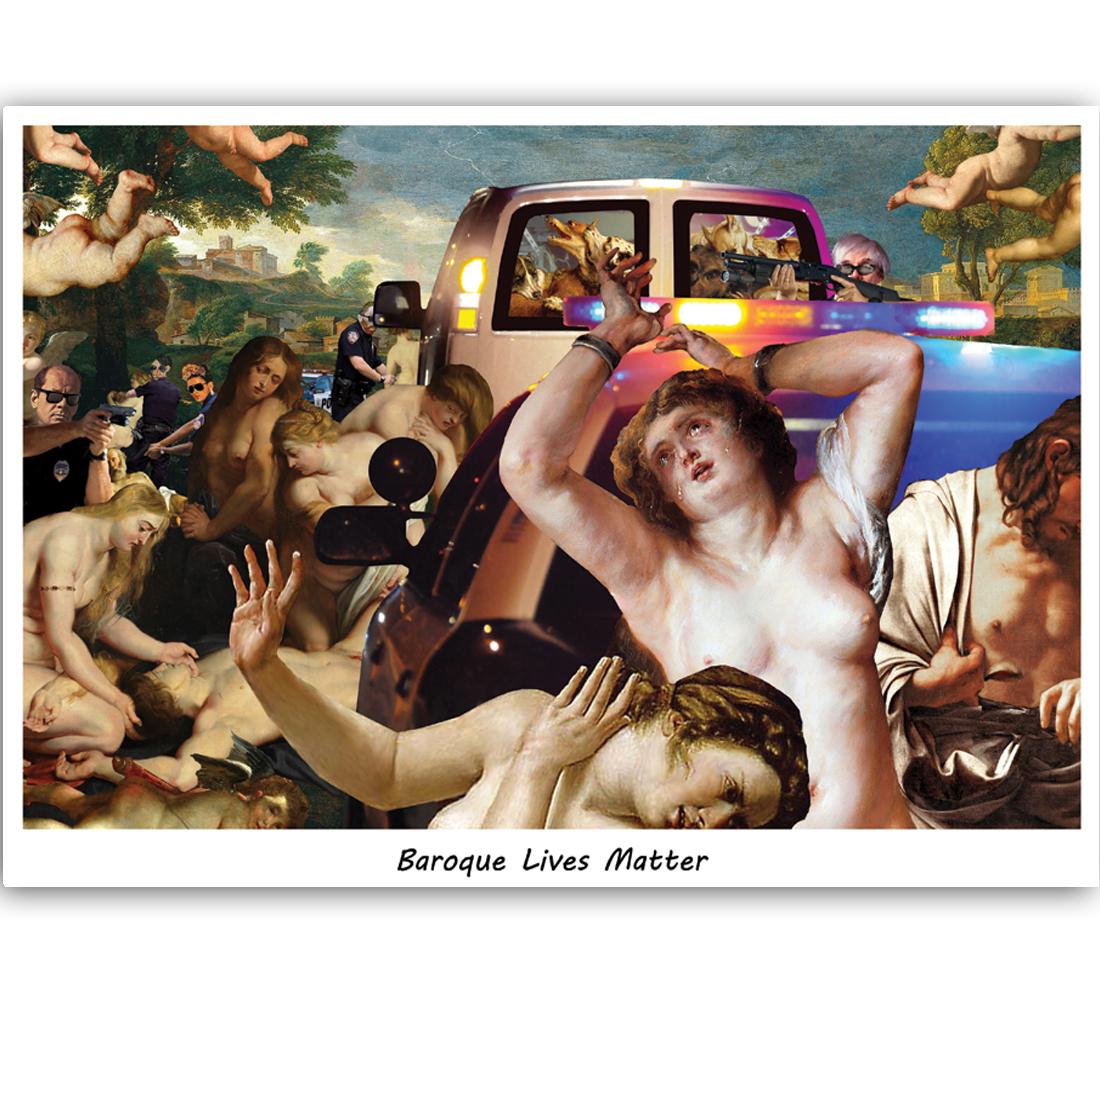 Baroque Lives Matter